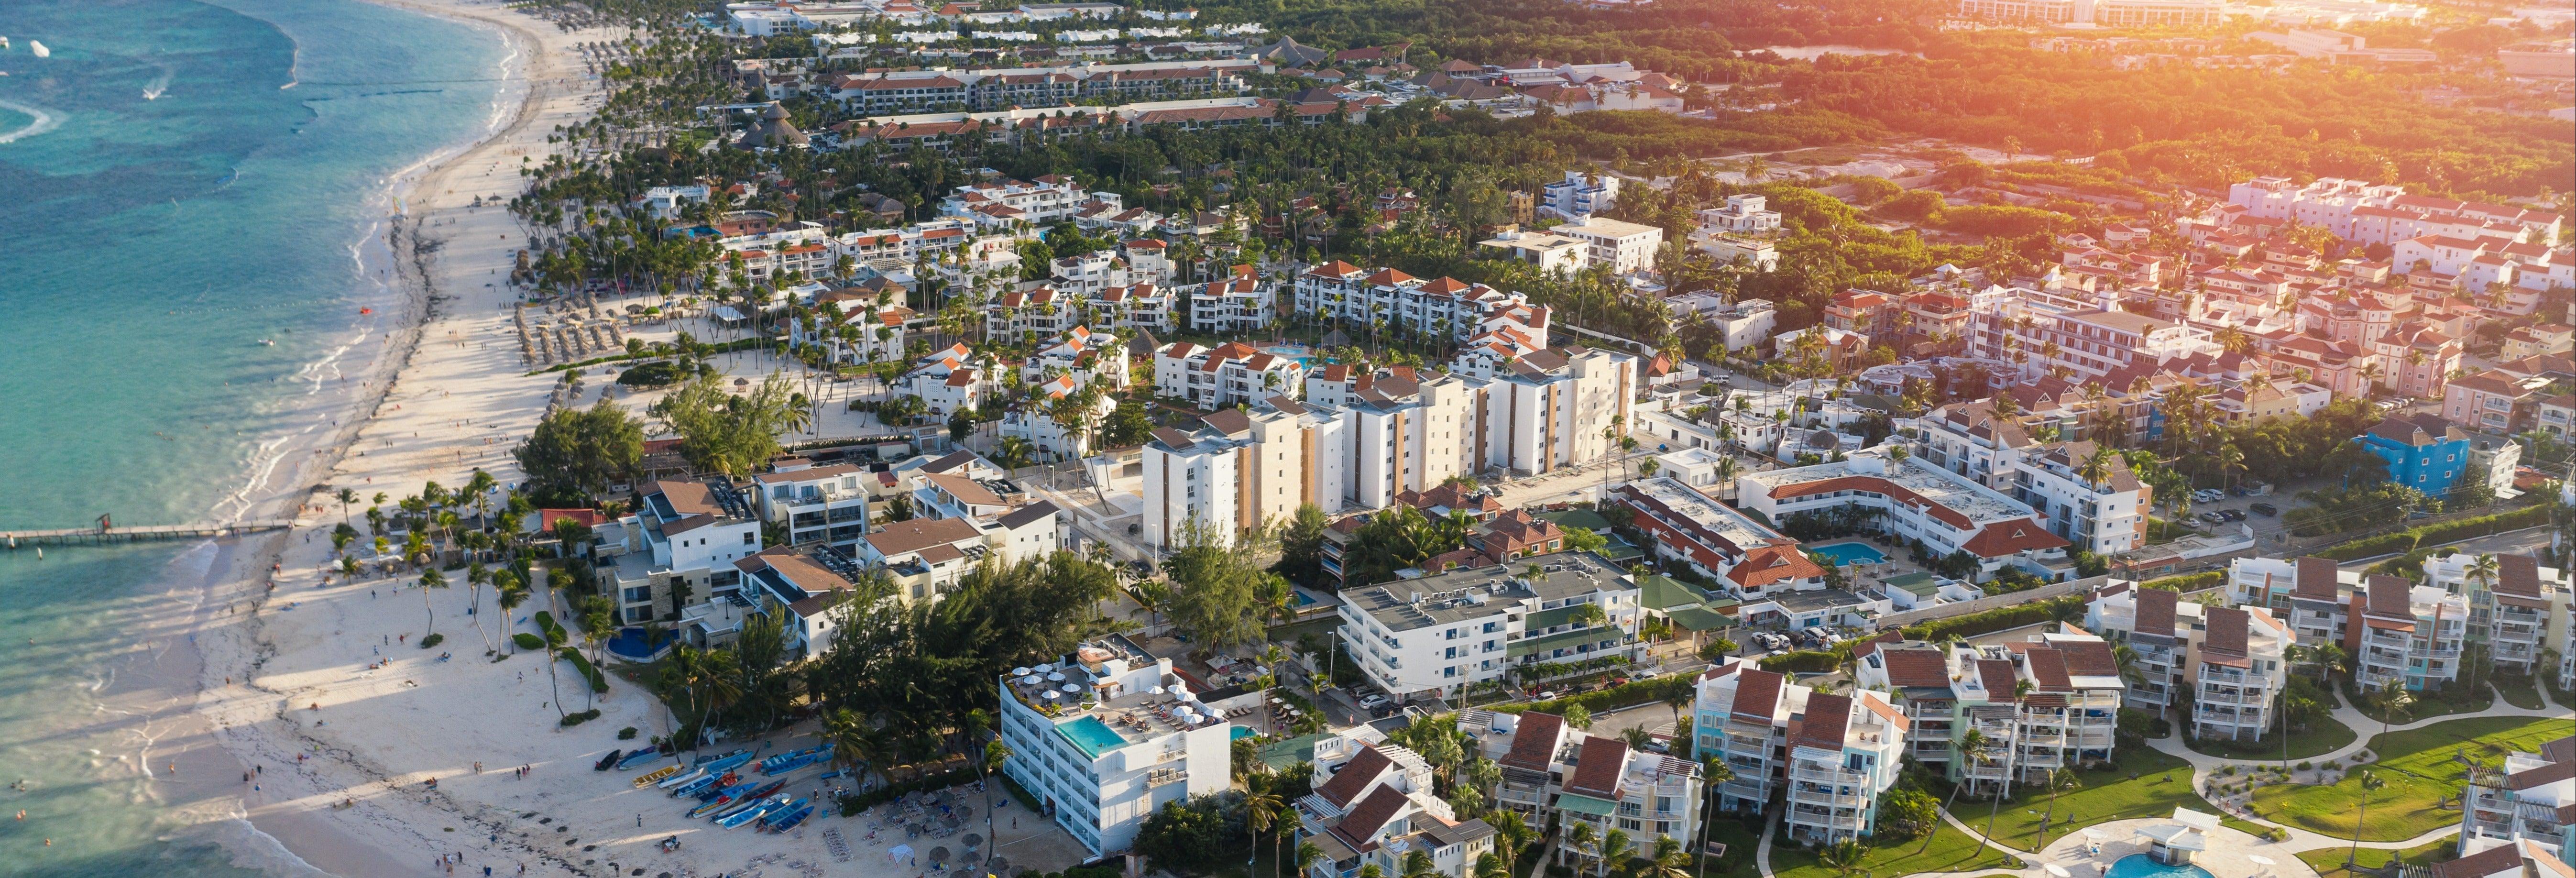 Vol en hélicoptère à Punta Cana